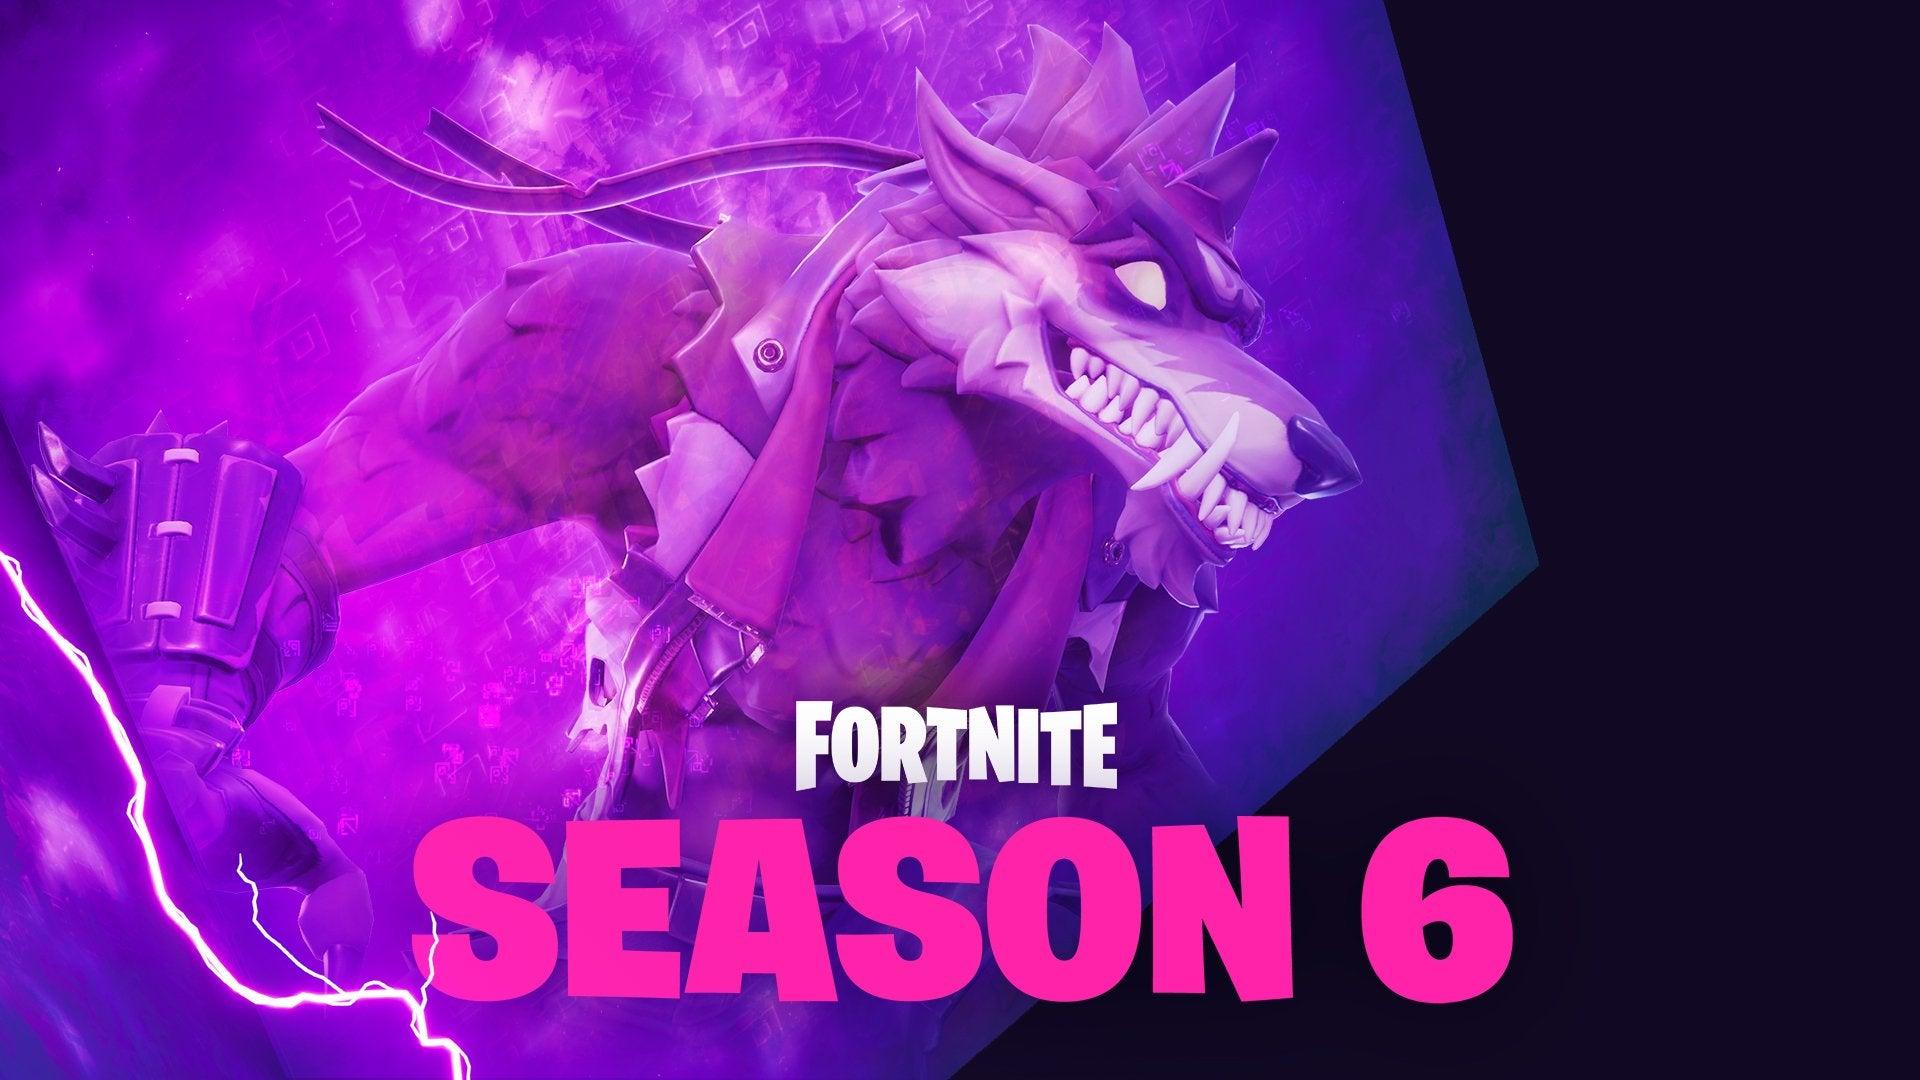 Image for Fortnite Season 6: final tease shows off werewolf skin